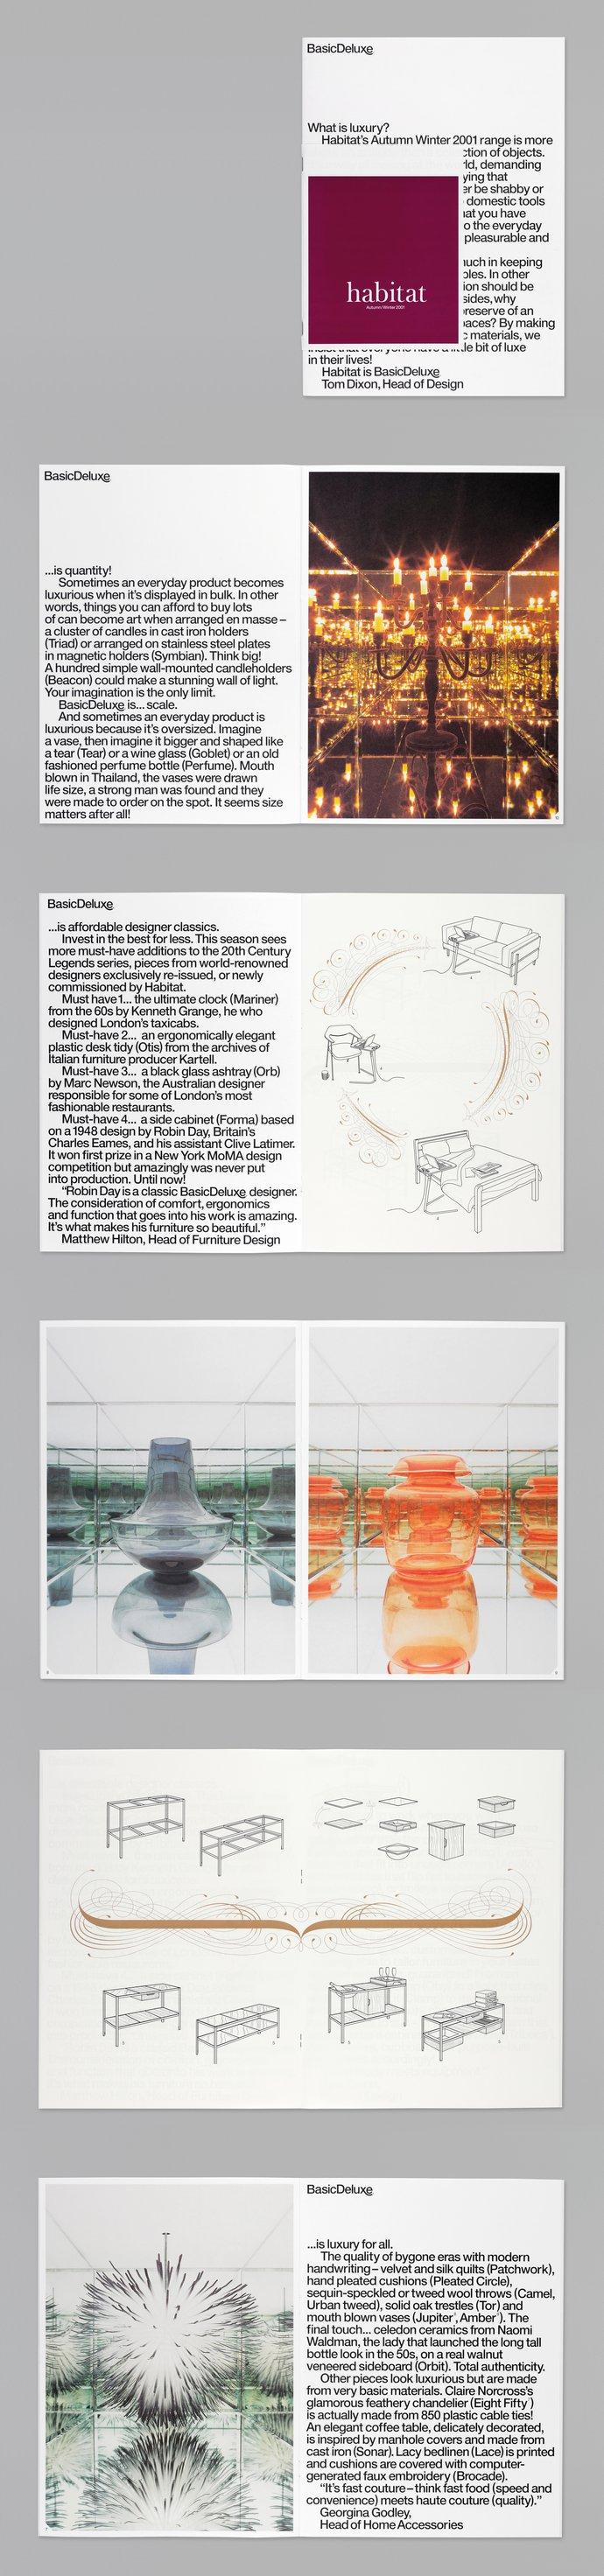 Habitat – Autumn/Winter 2001: Basic Deluxe collection (Retail), image 1